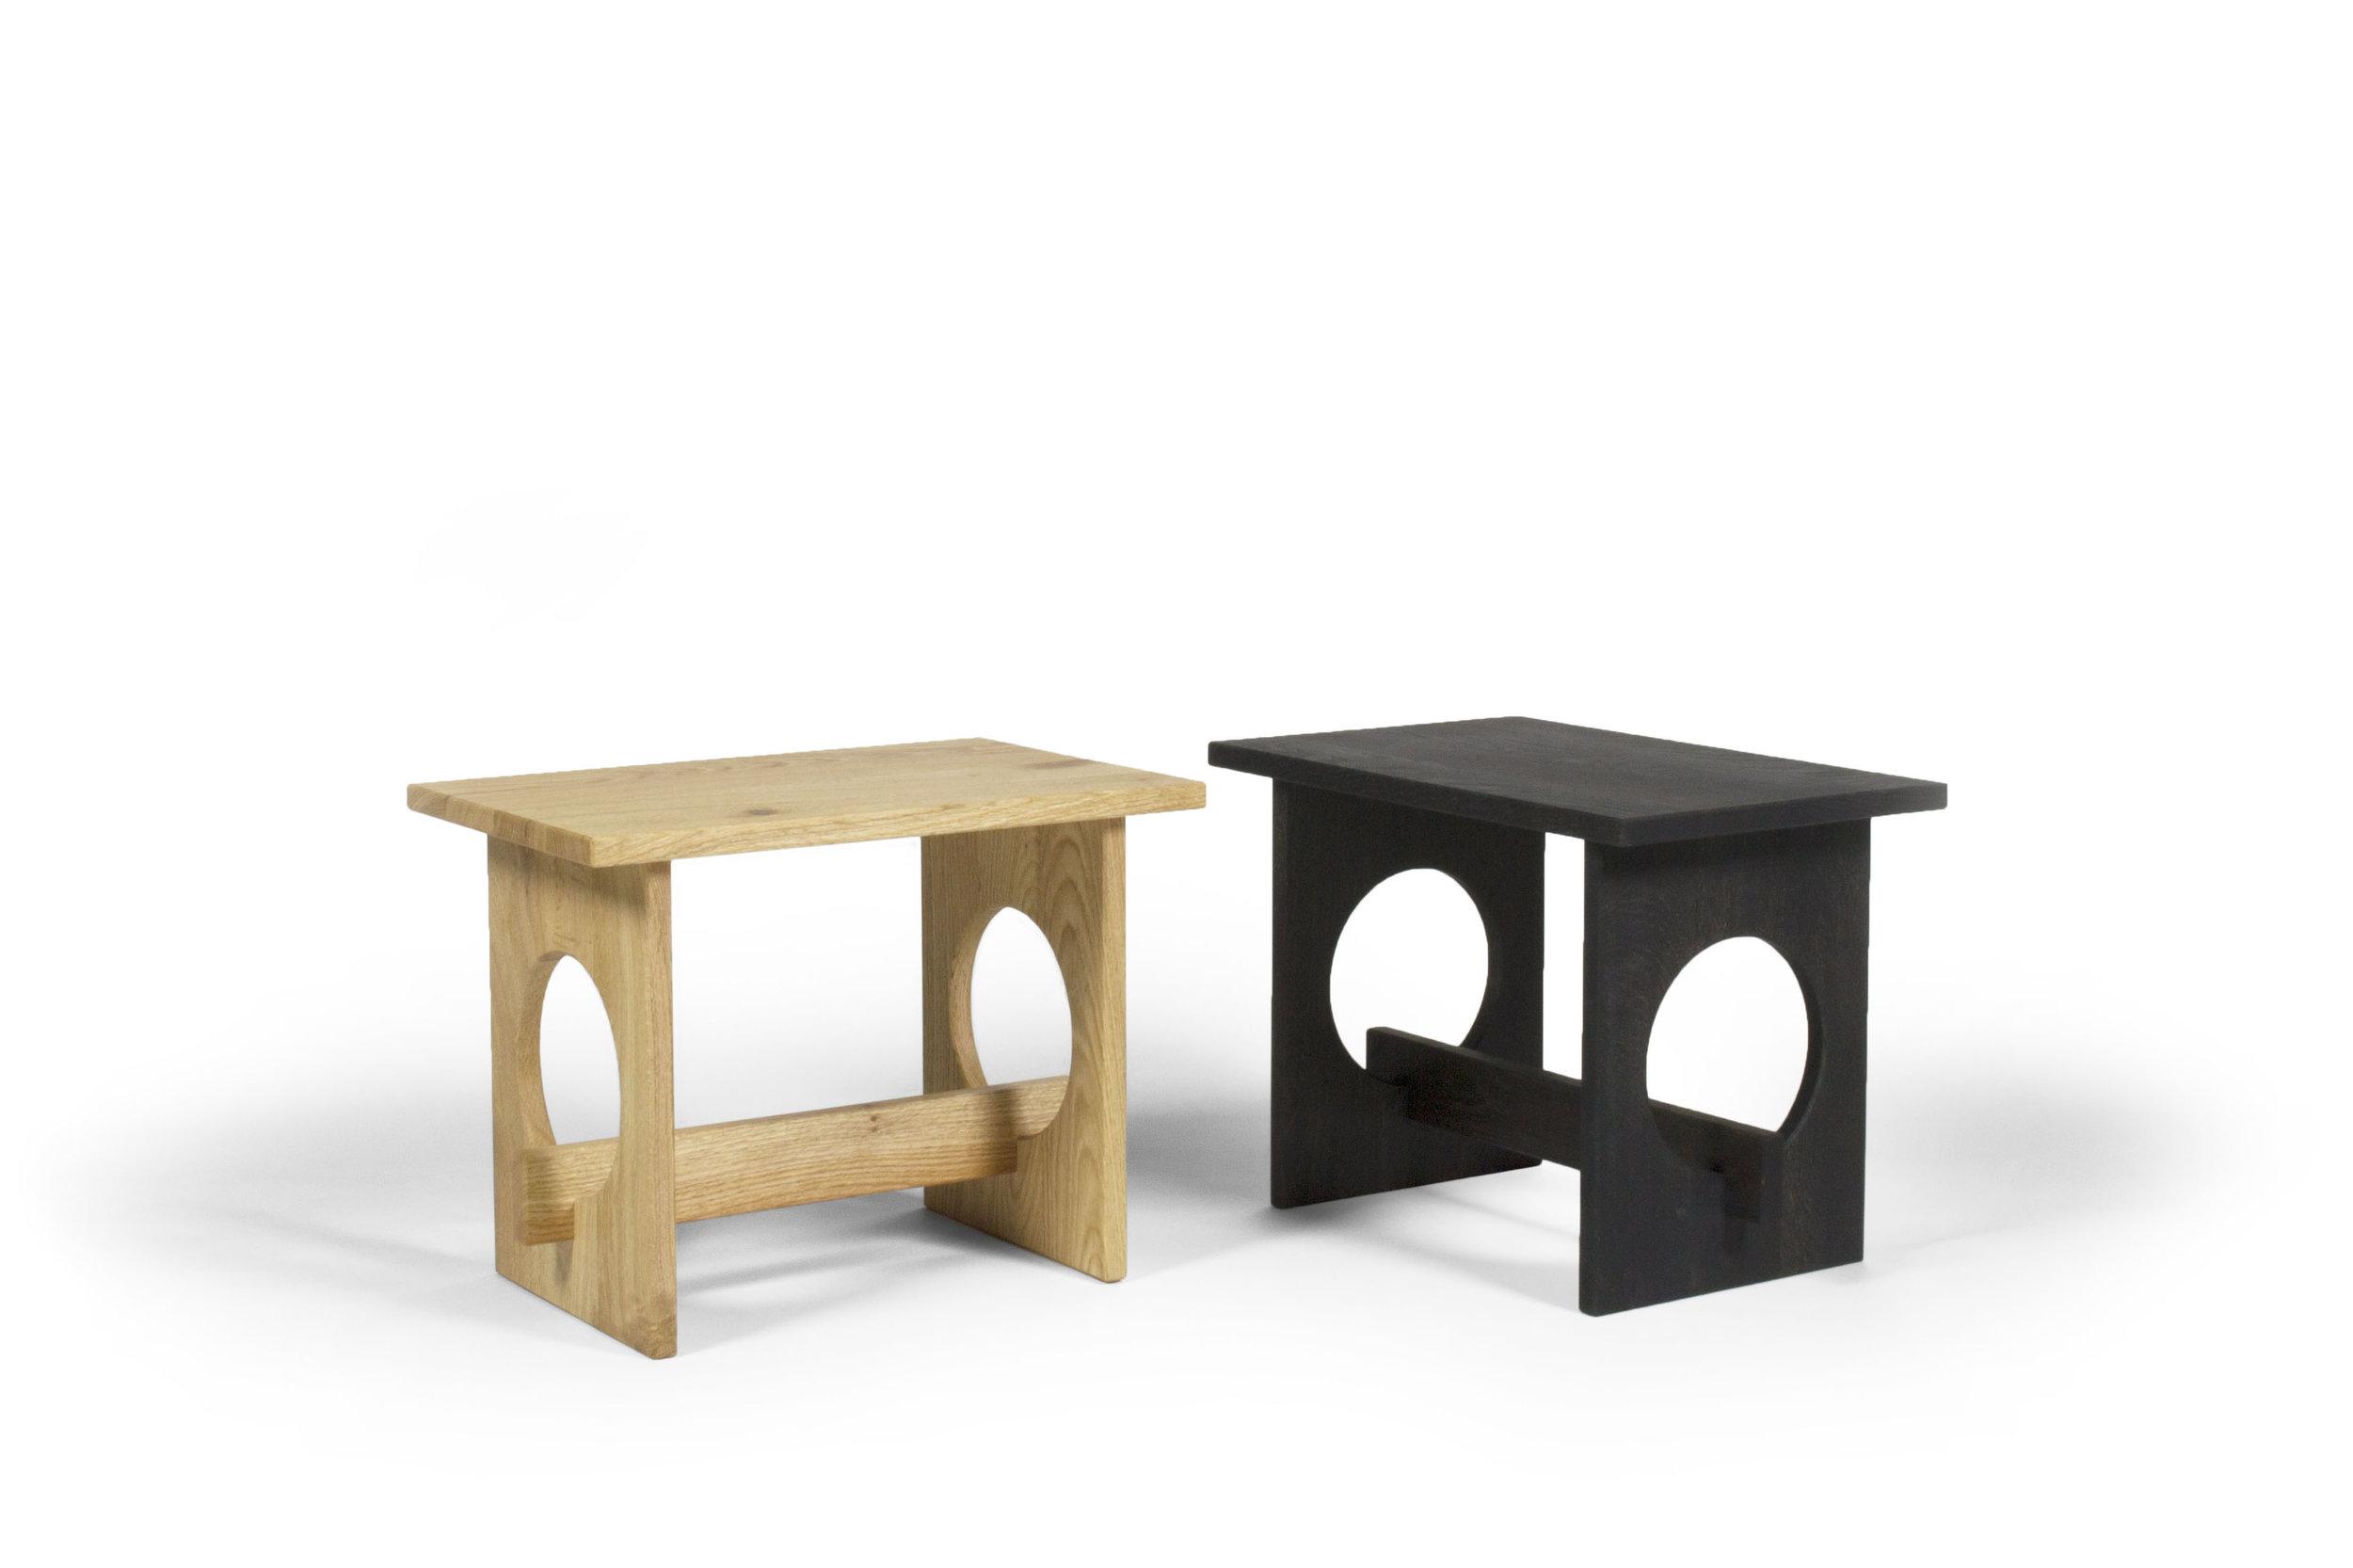 stools both.jpg